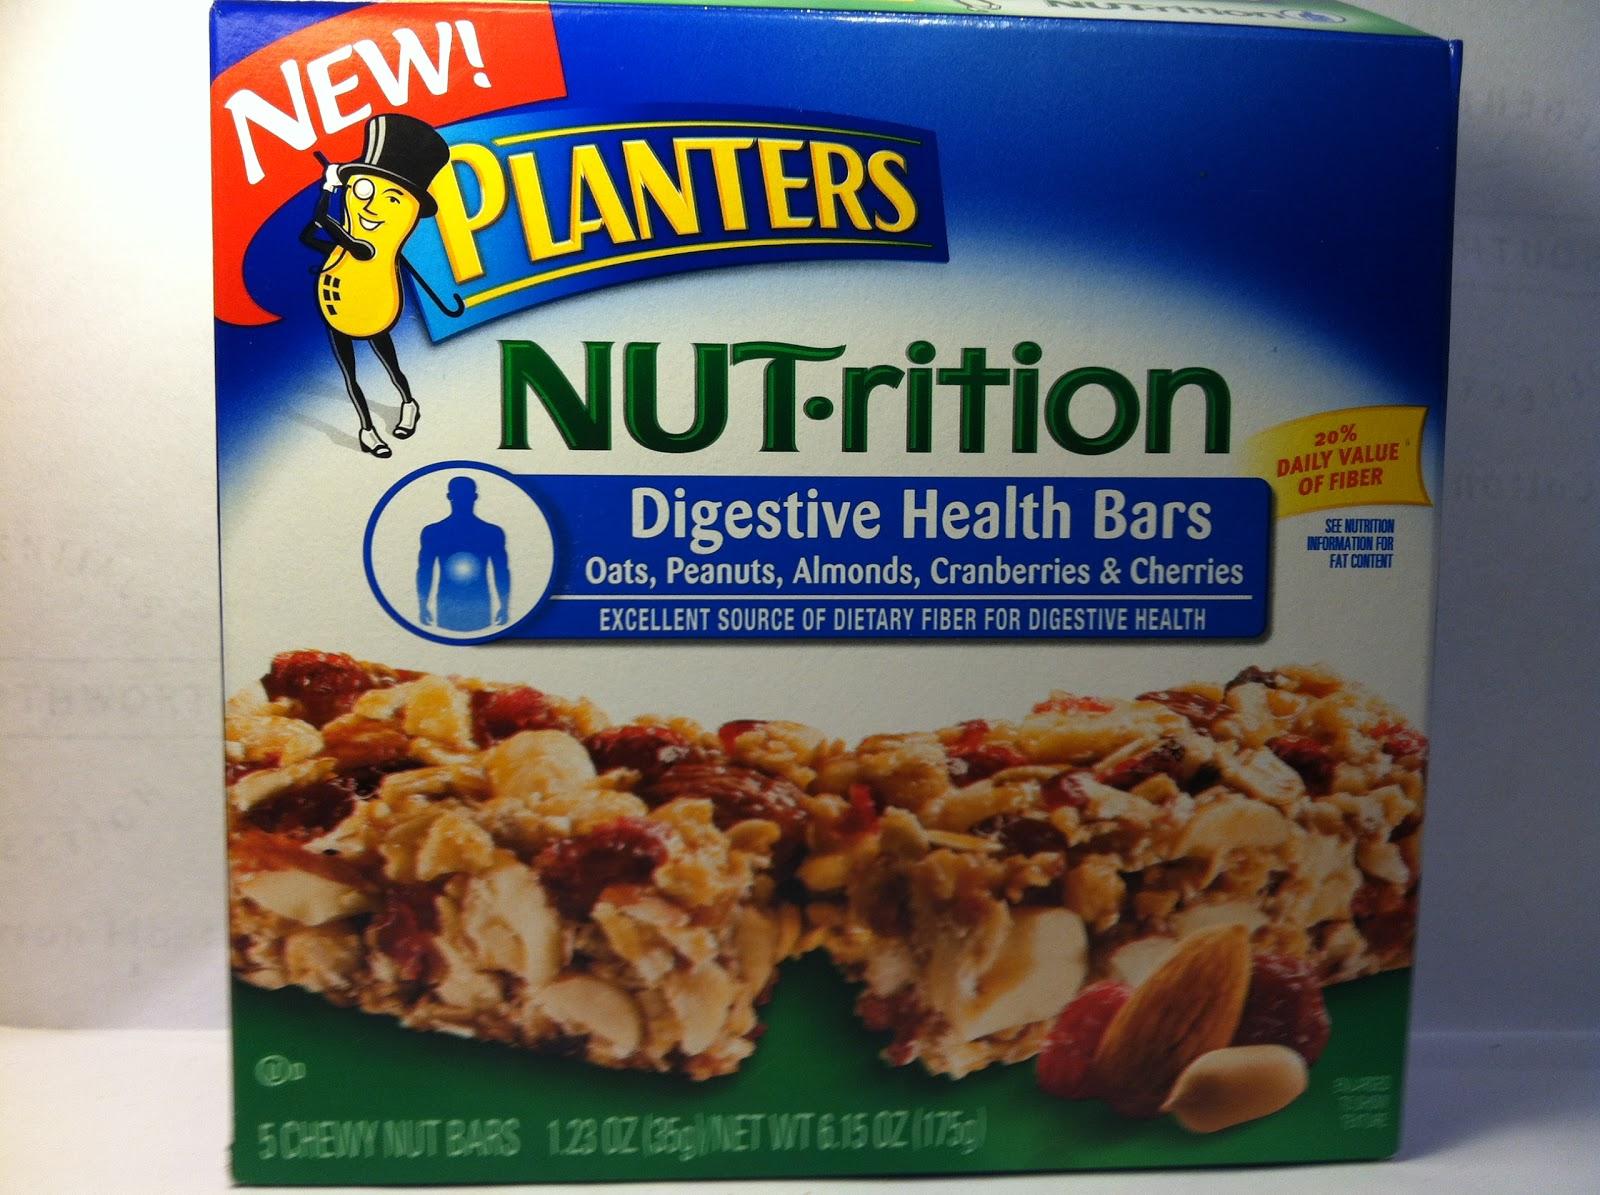 Planters+NUT-rition+Digestive+Health+Bar